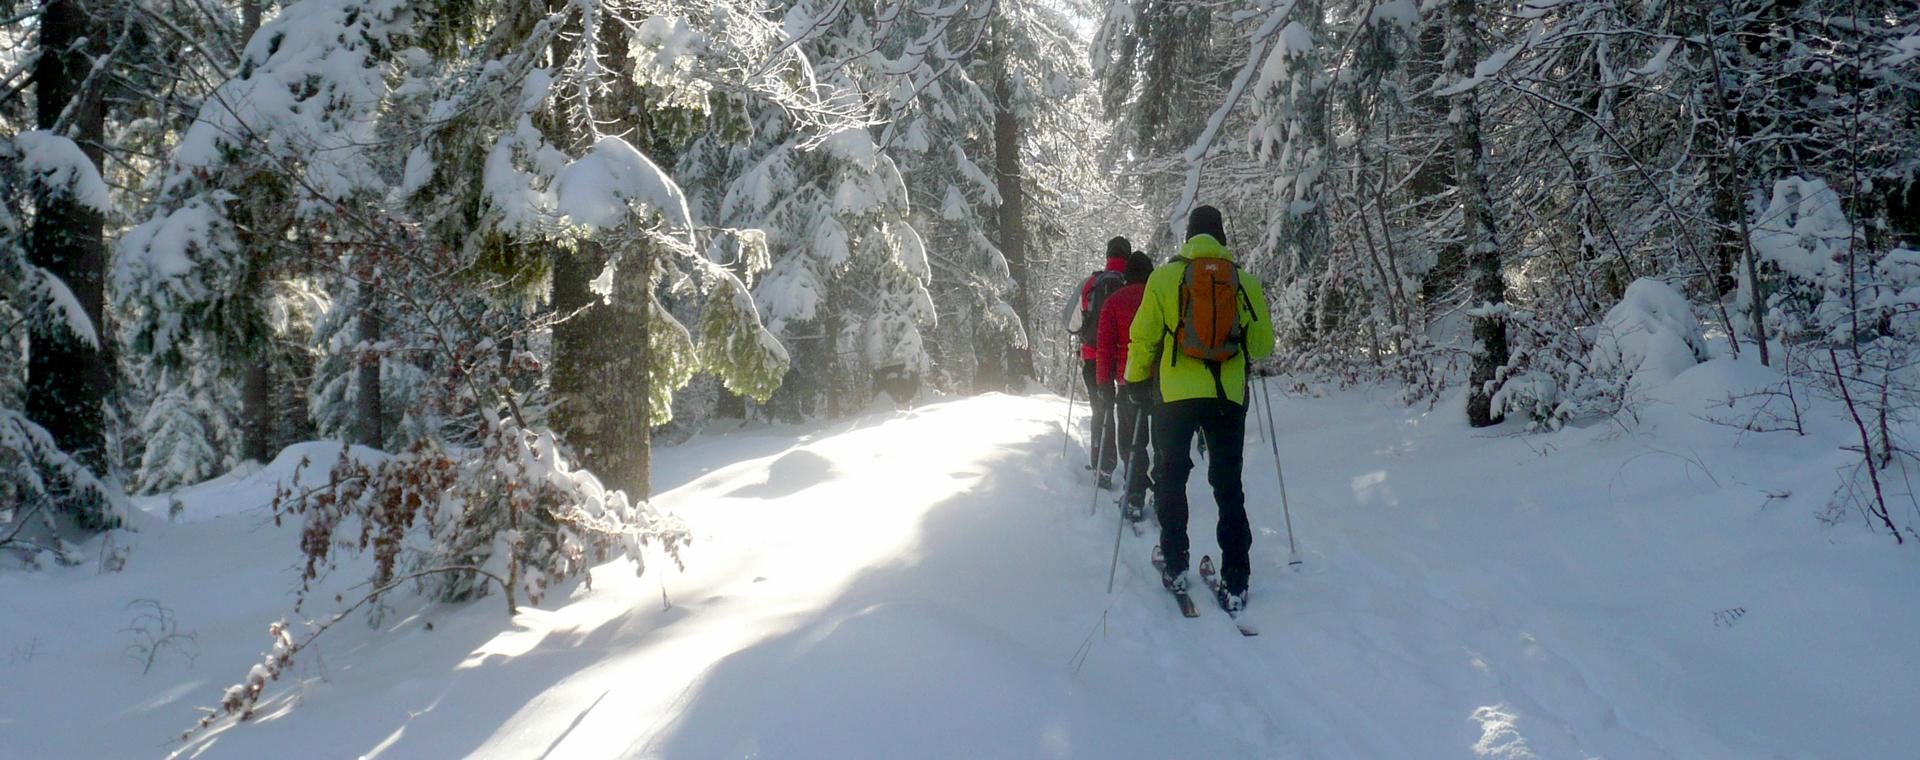 Image Vercors et Oxygène, version duo ski